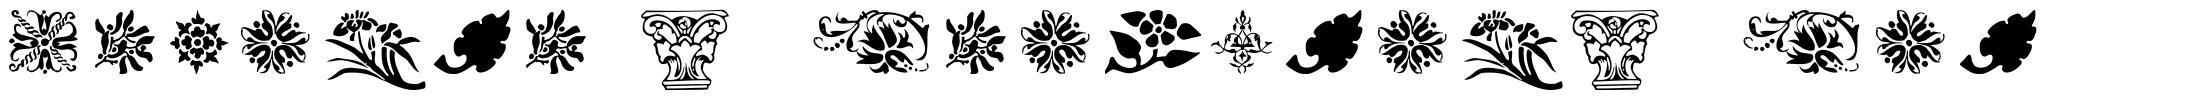 Printer's Ornaments One font